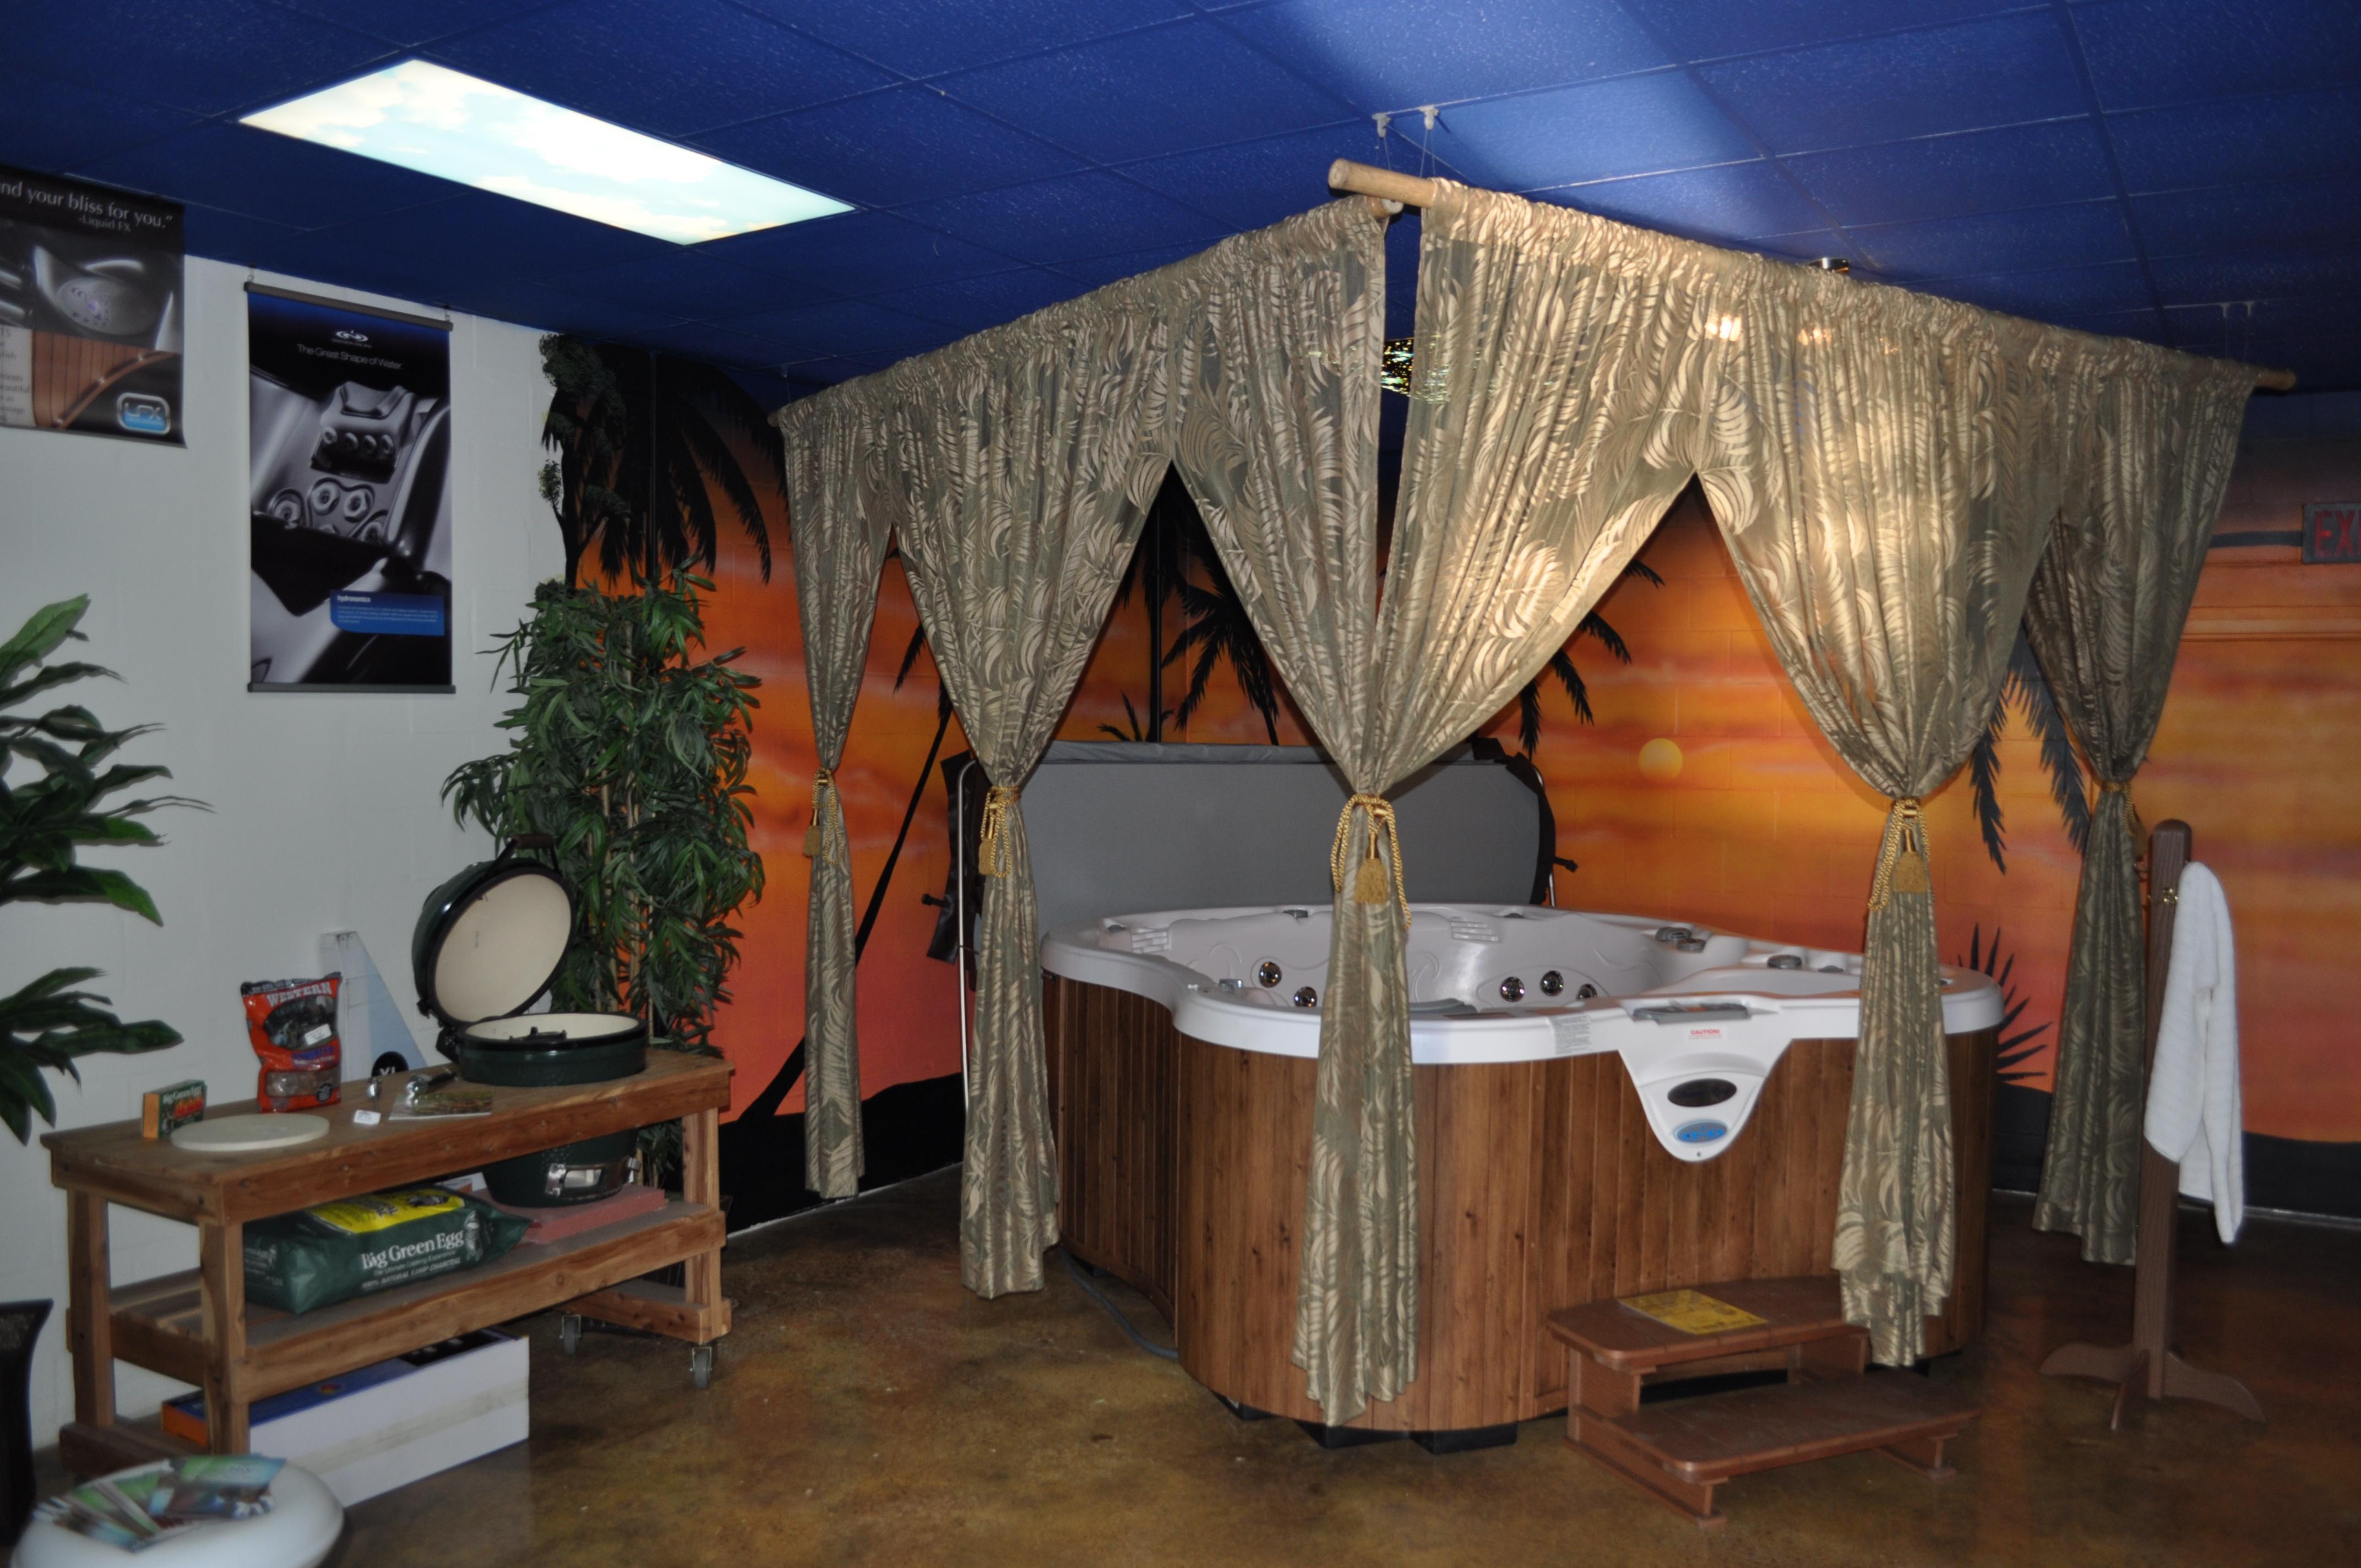 Pinch a penny pool patios spas in seminole fl 727 for Pinch a penny pool pump motors